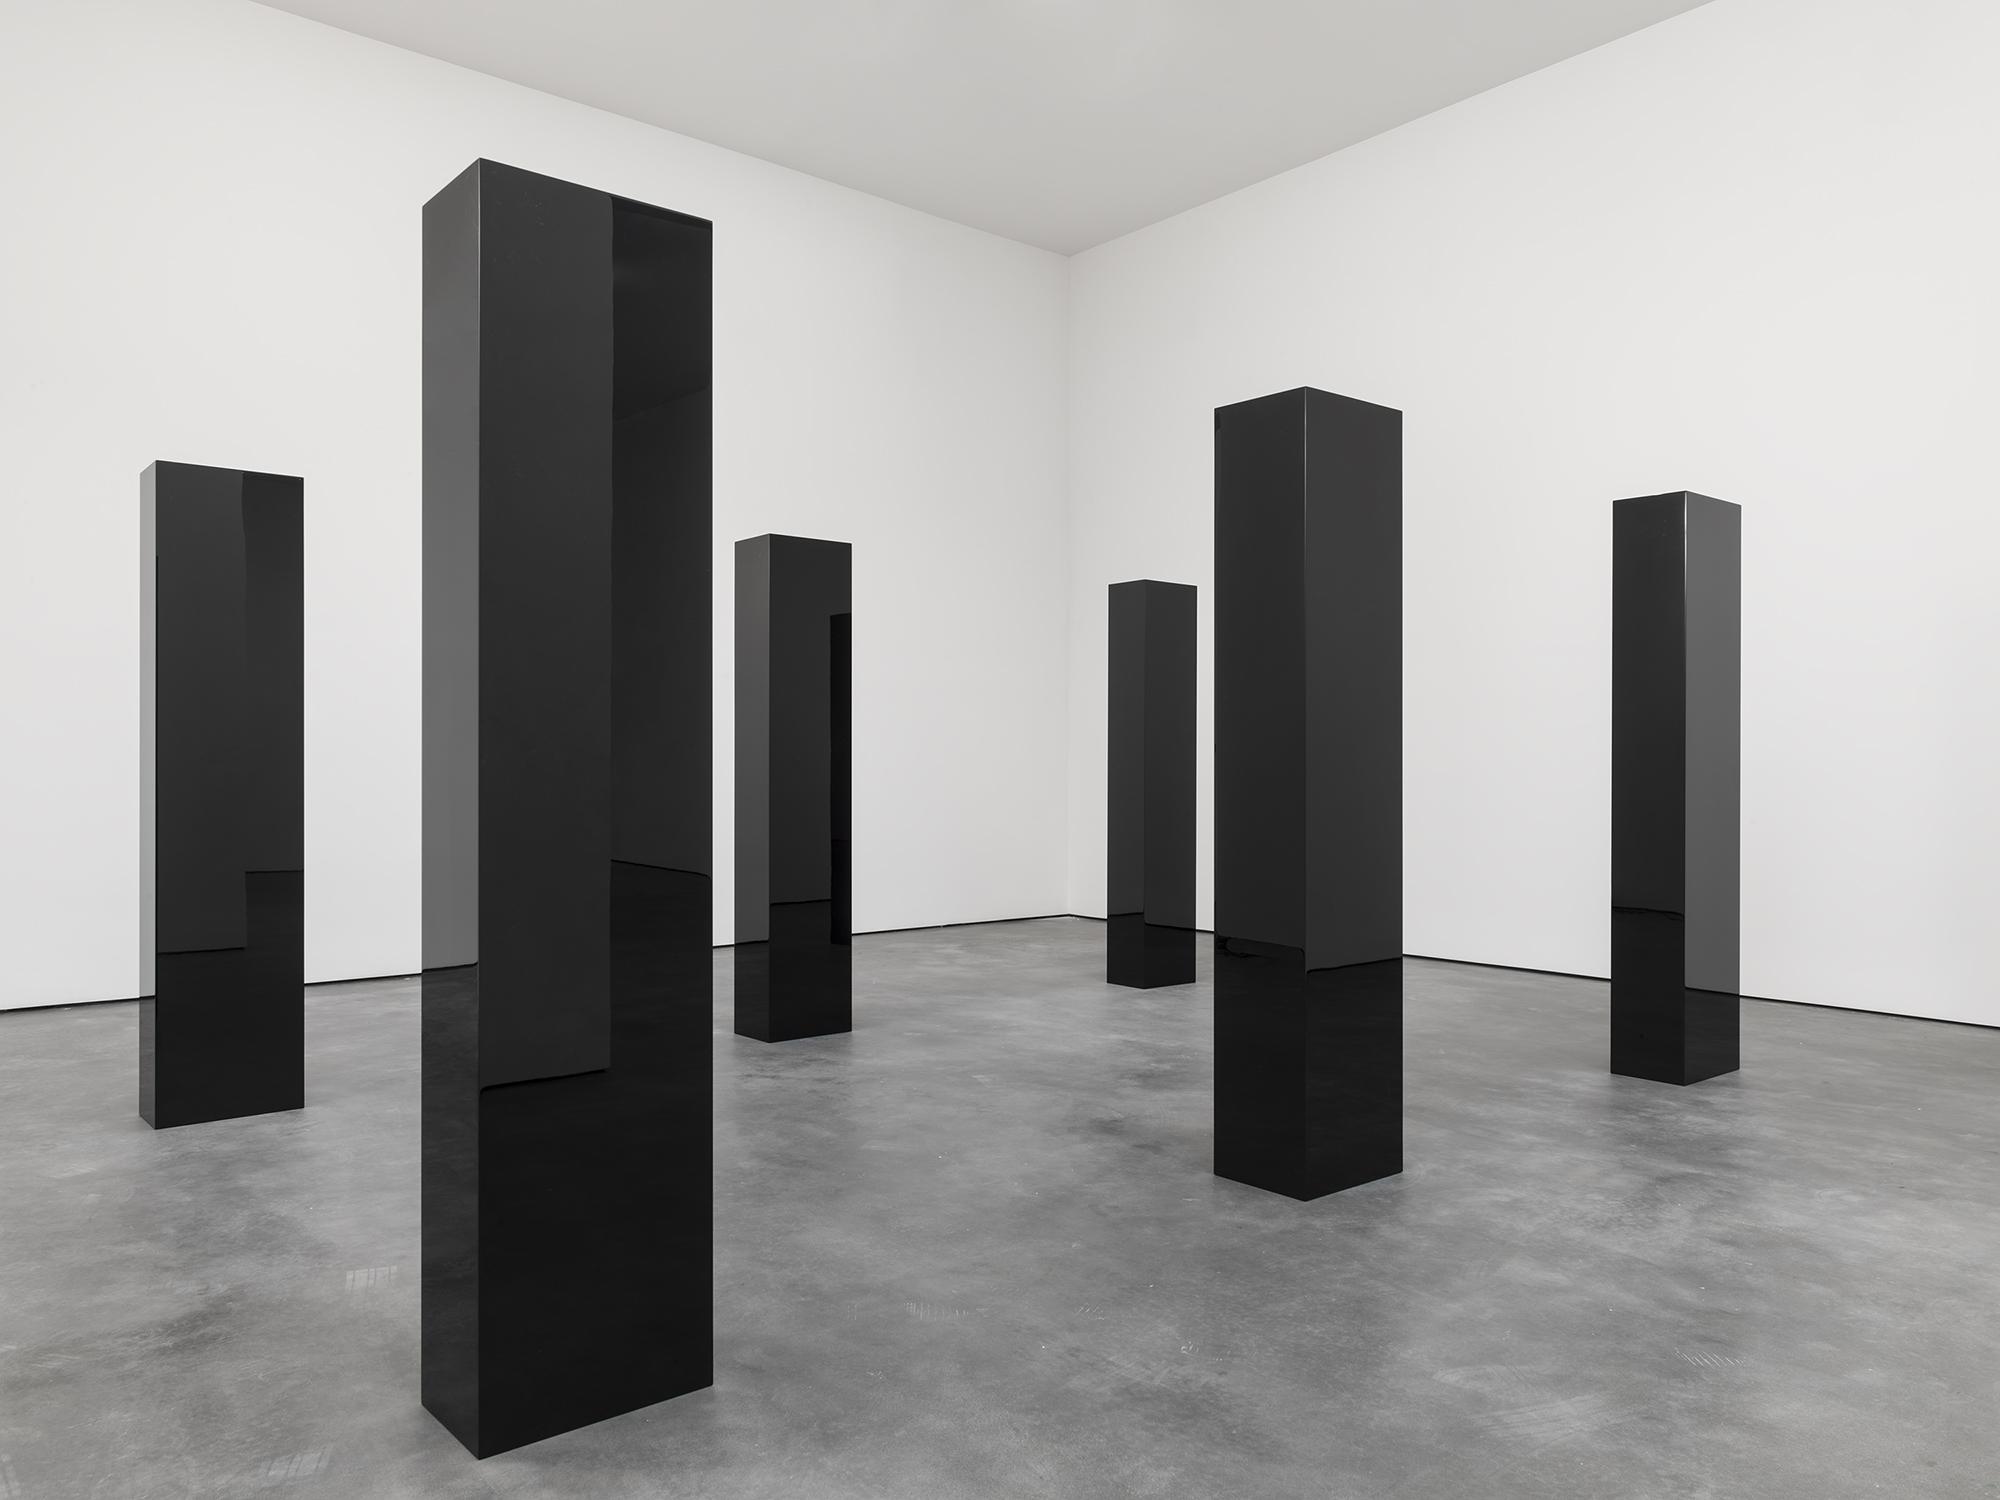 John mccracken david zwirner for Minimal art installation